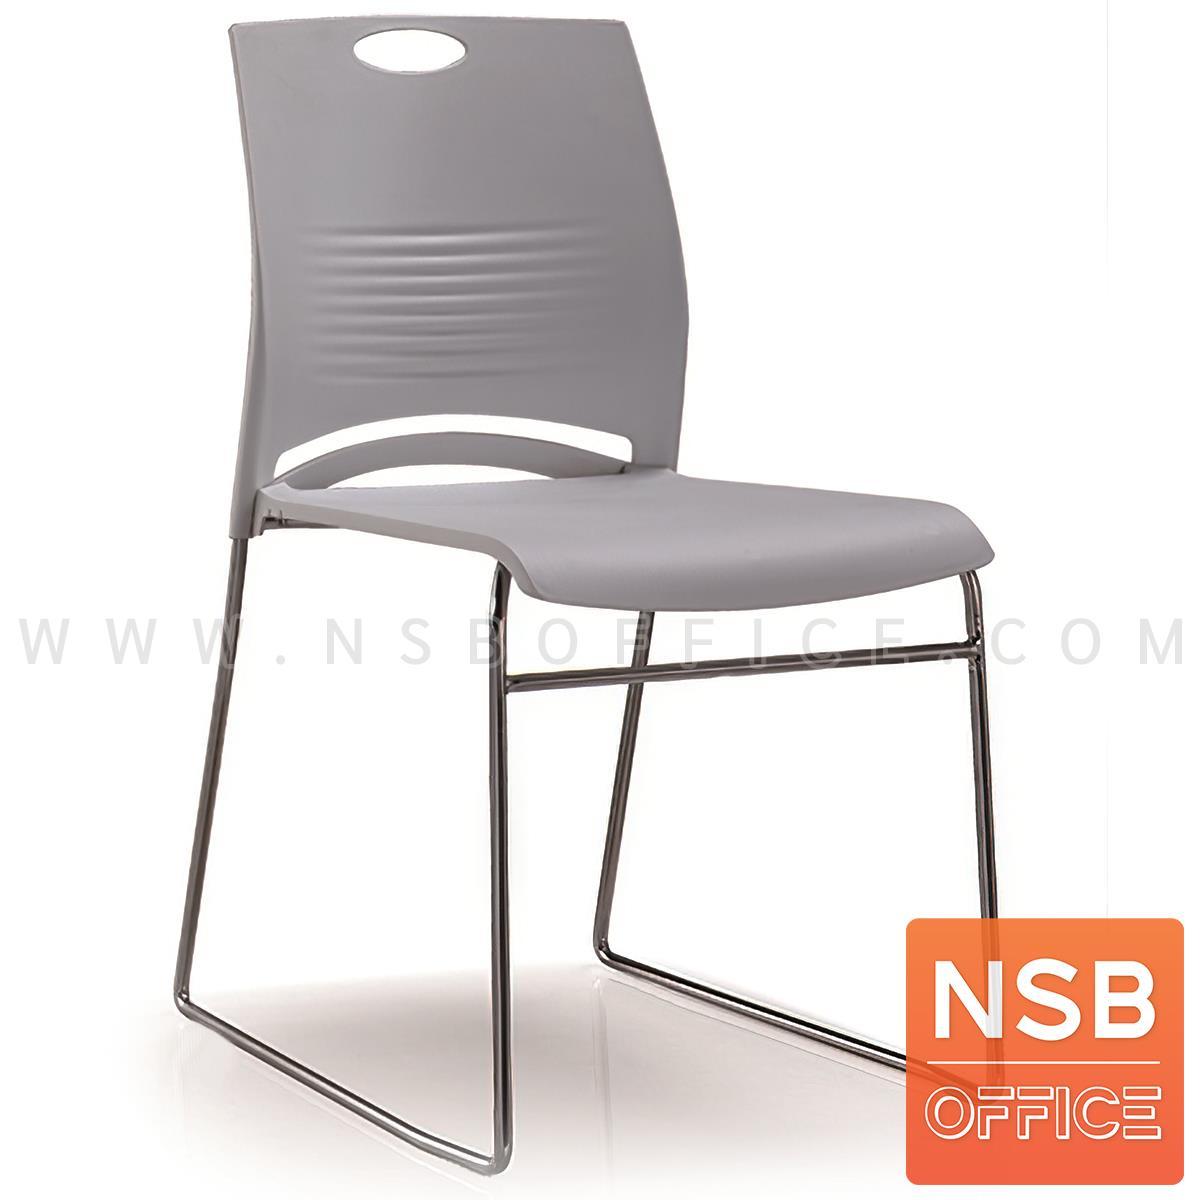 B05A175:เก้าอี้อเนกประสงค์เฟรมโพลี่ รุ่น Brick (บริค) โครงขาเหล็ก